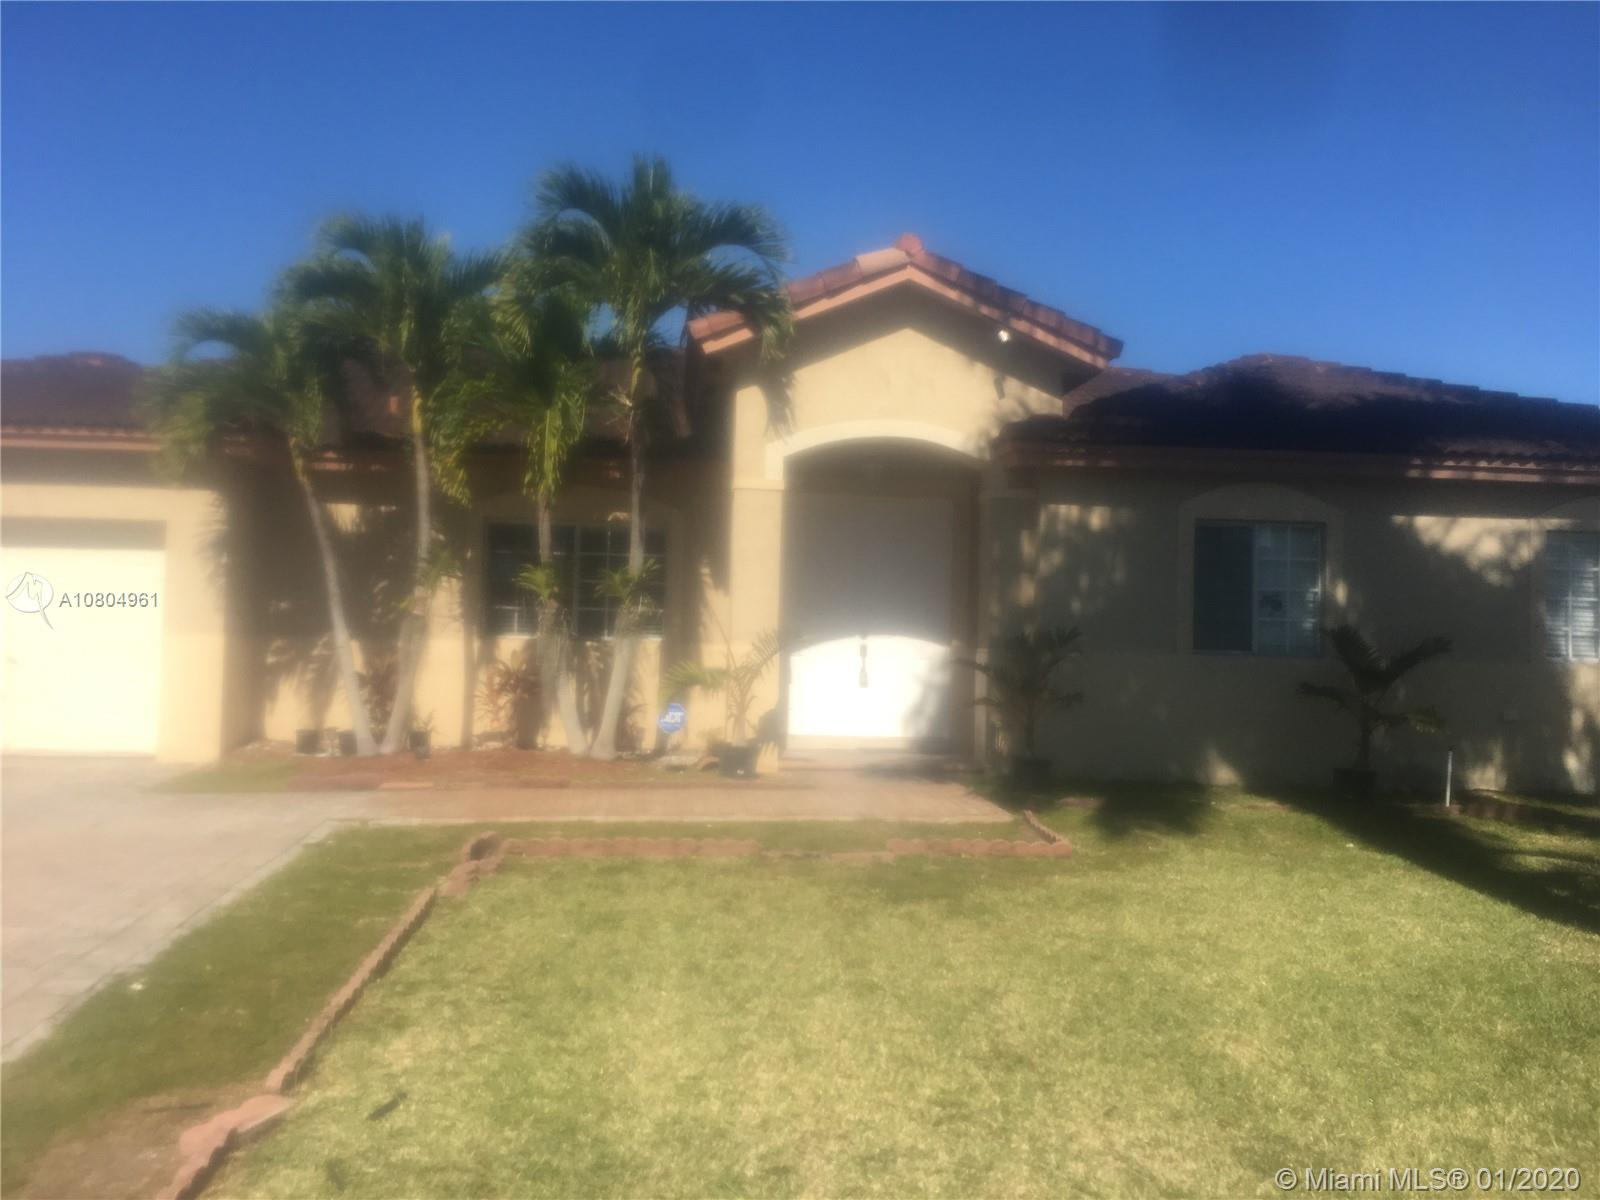 14253 SW 289th Ter, Homestead, FL 33033 - Homestead, FL real estate listing